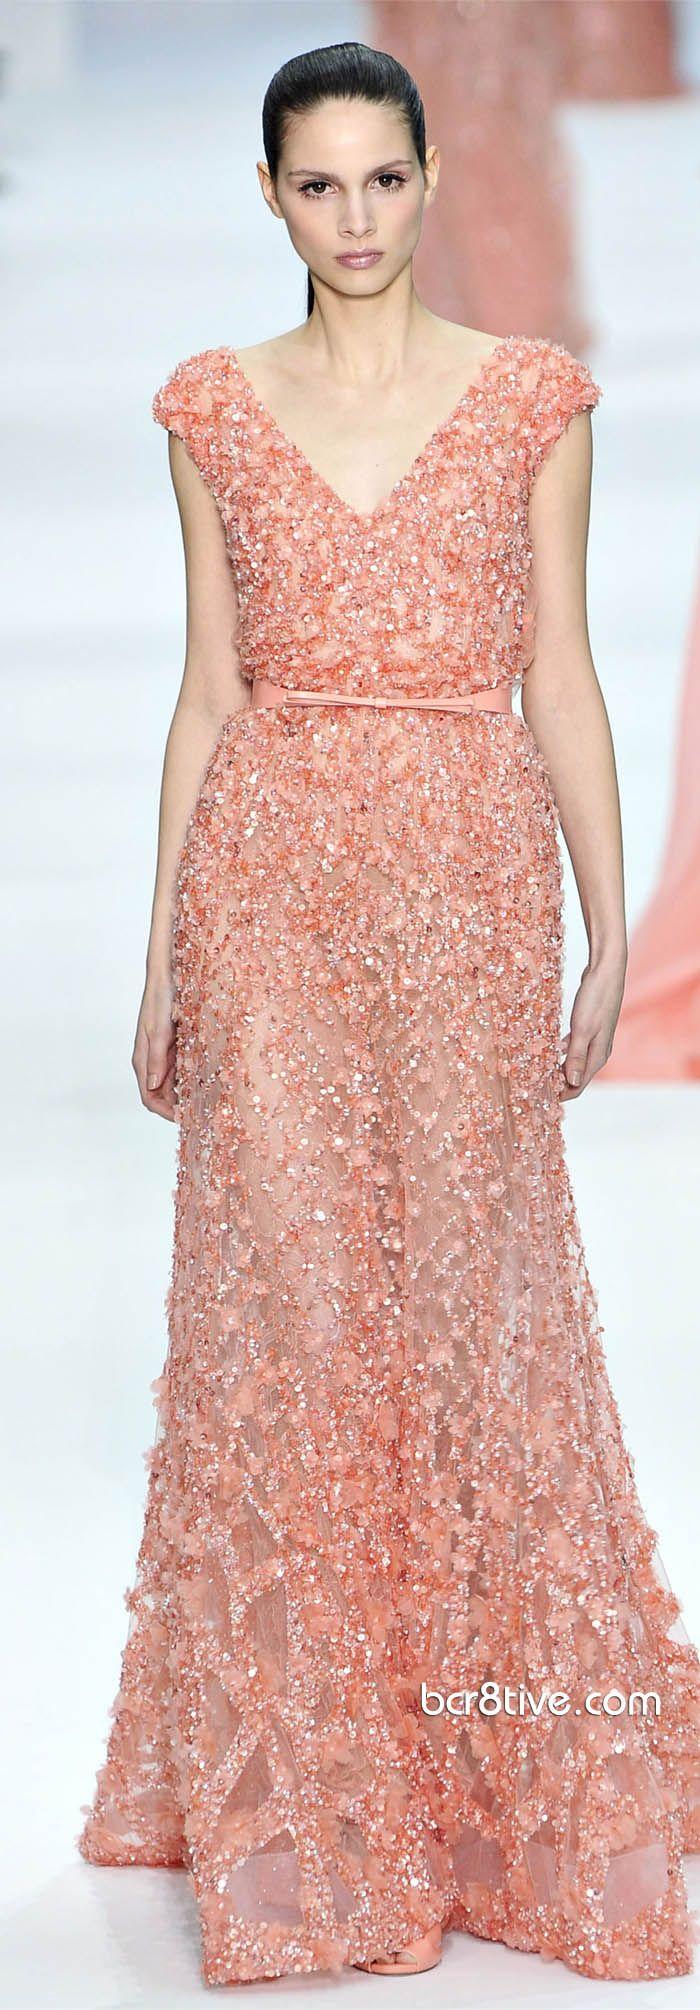 Elie Saab Spring Summer 2012 Haute Couture | Desfile de moda ...